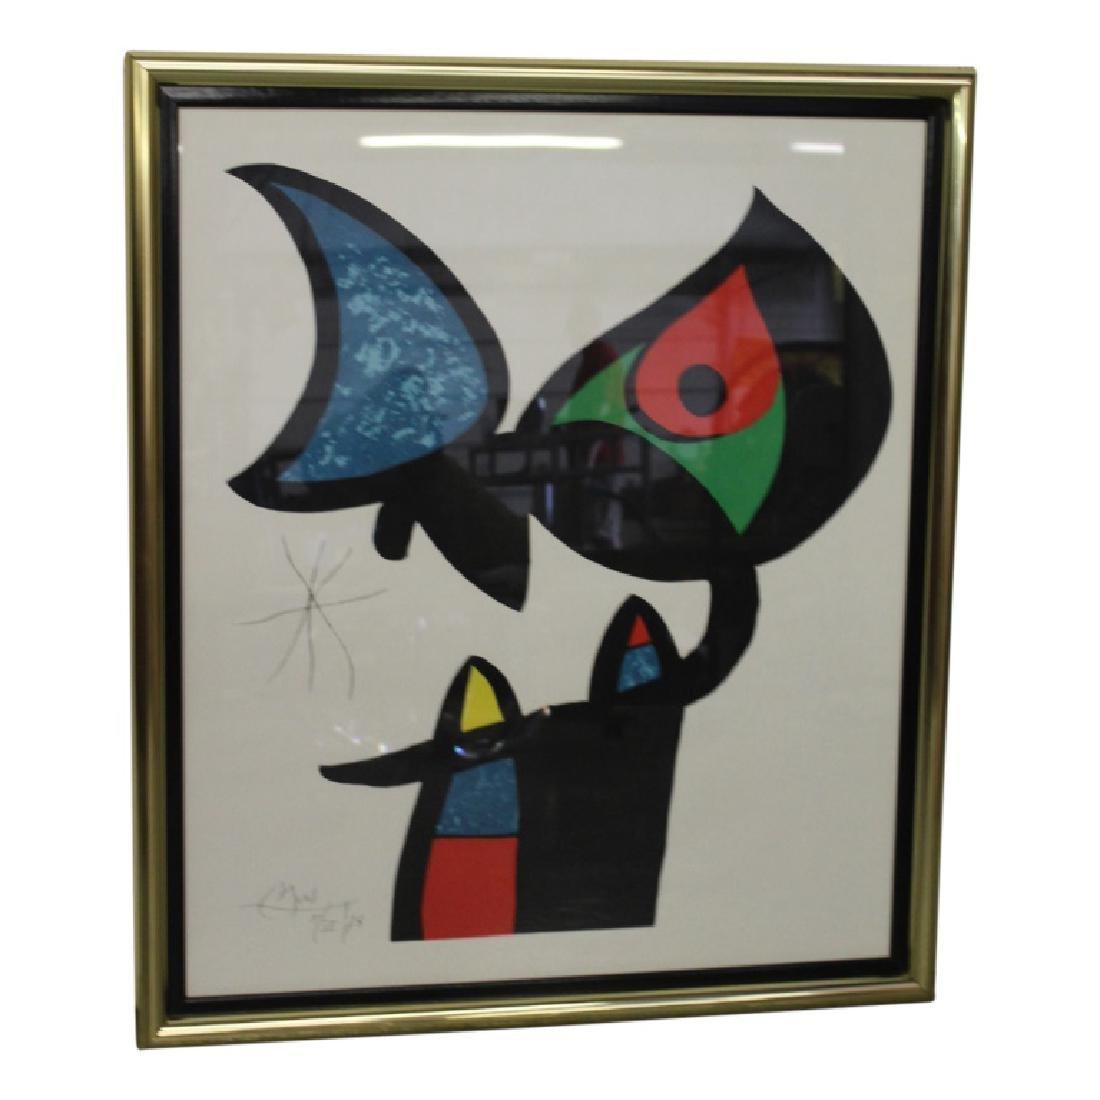 Espriu by Joan Miro Lithograph